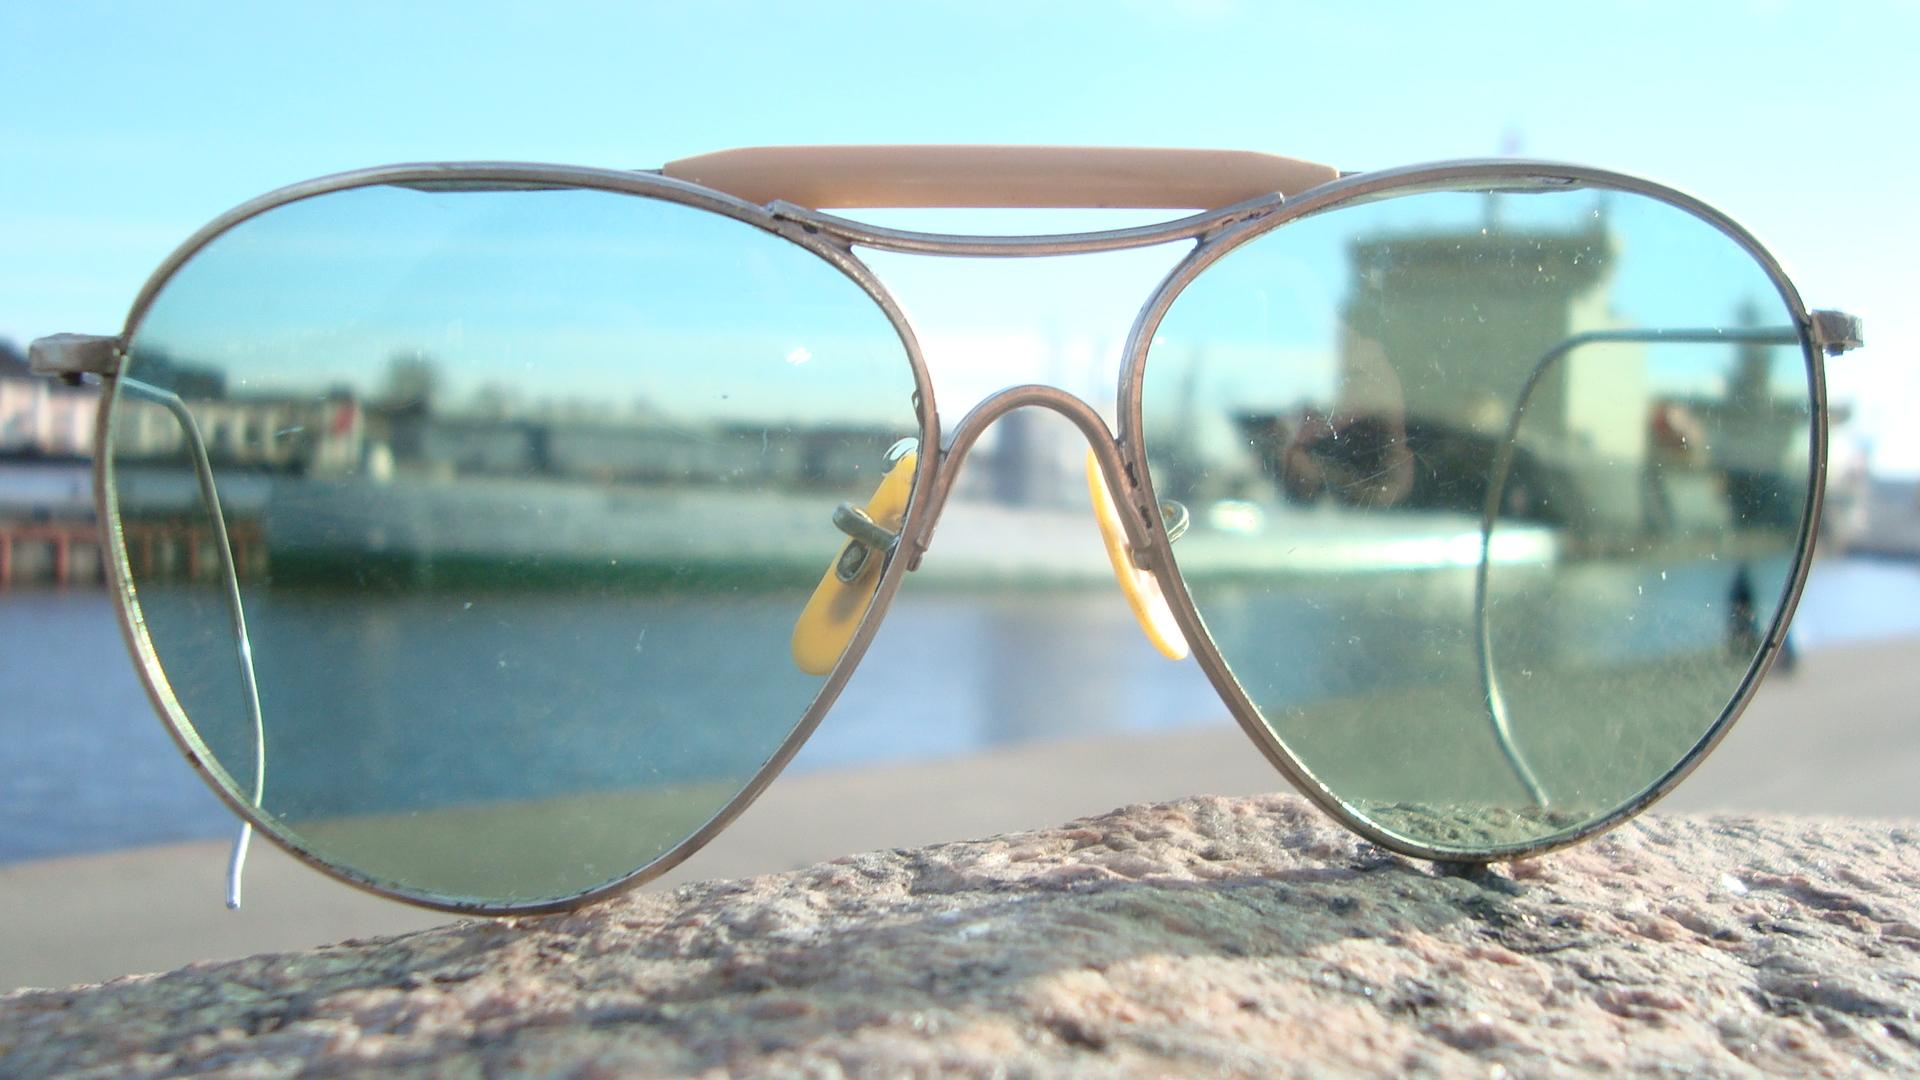 4a2de4b1be16 File American Optical AN6531 Sunglasses.jpg - Wikimedia Commons